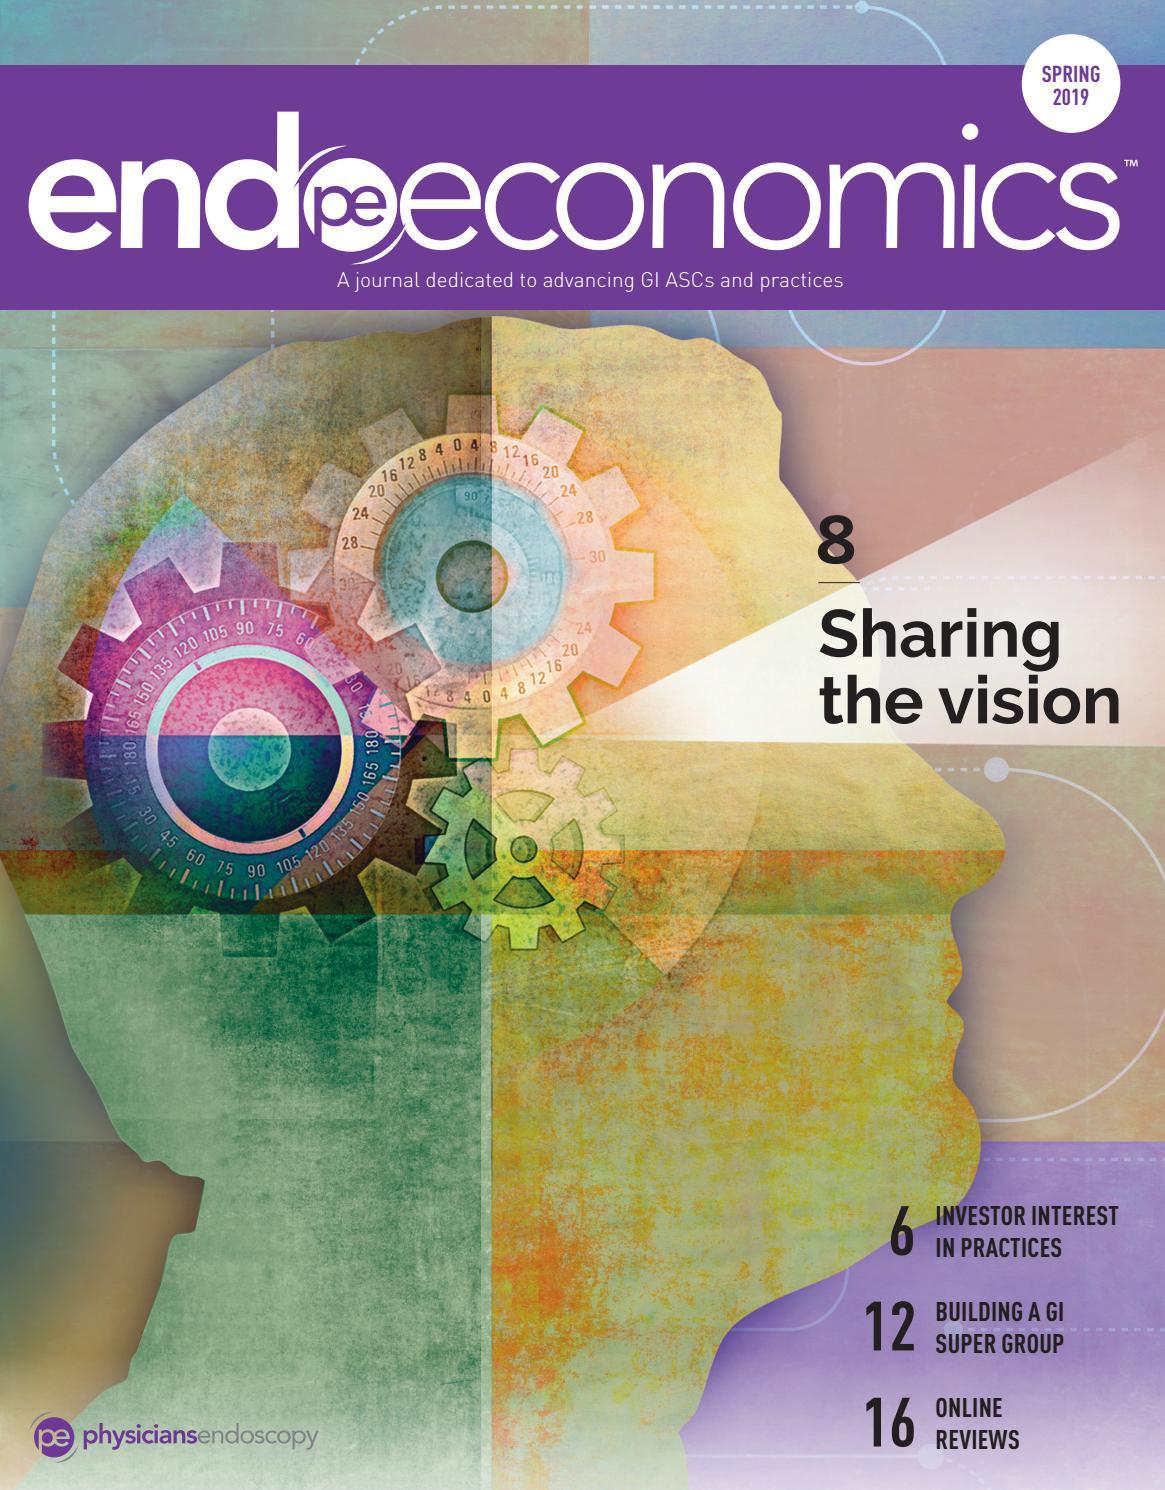 Endoscope Design: EndoEconomics Spring 2019 Issue By Physicians Endoscopy